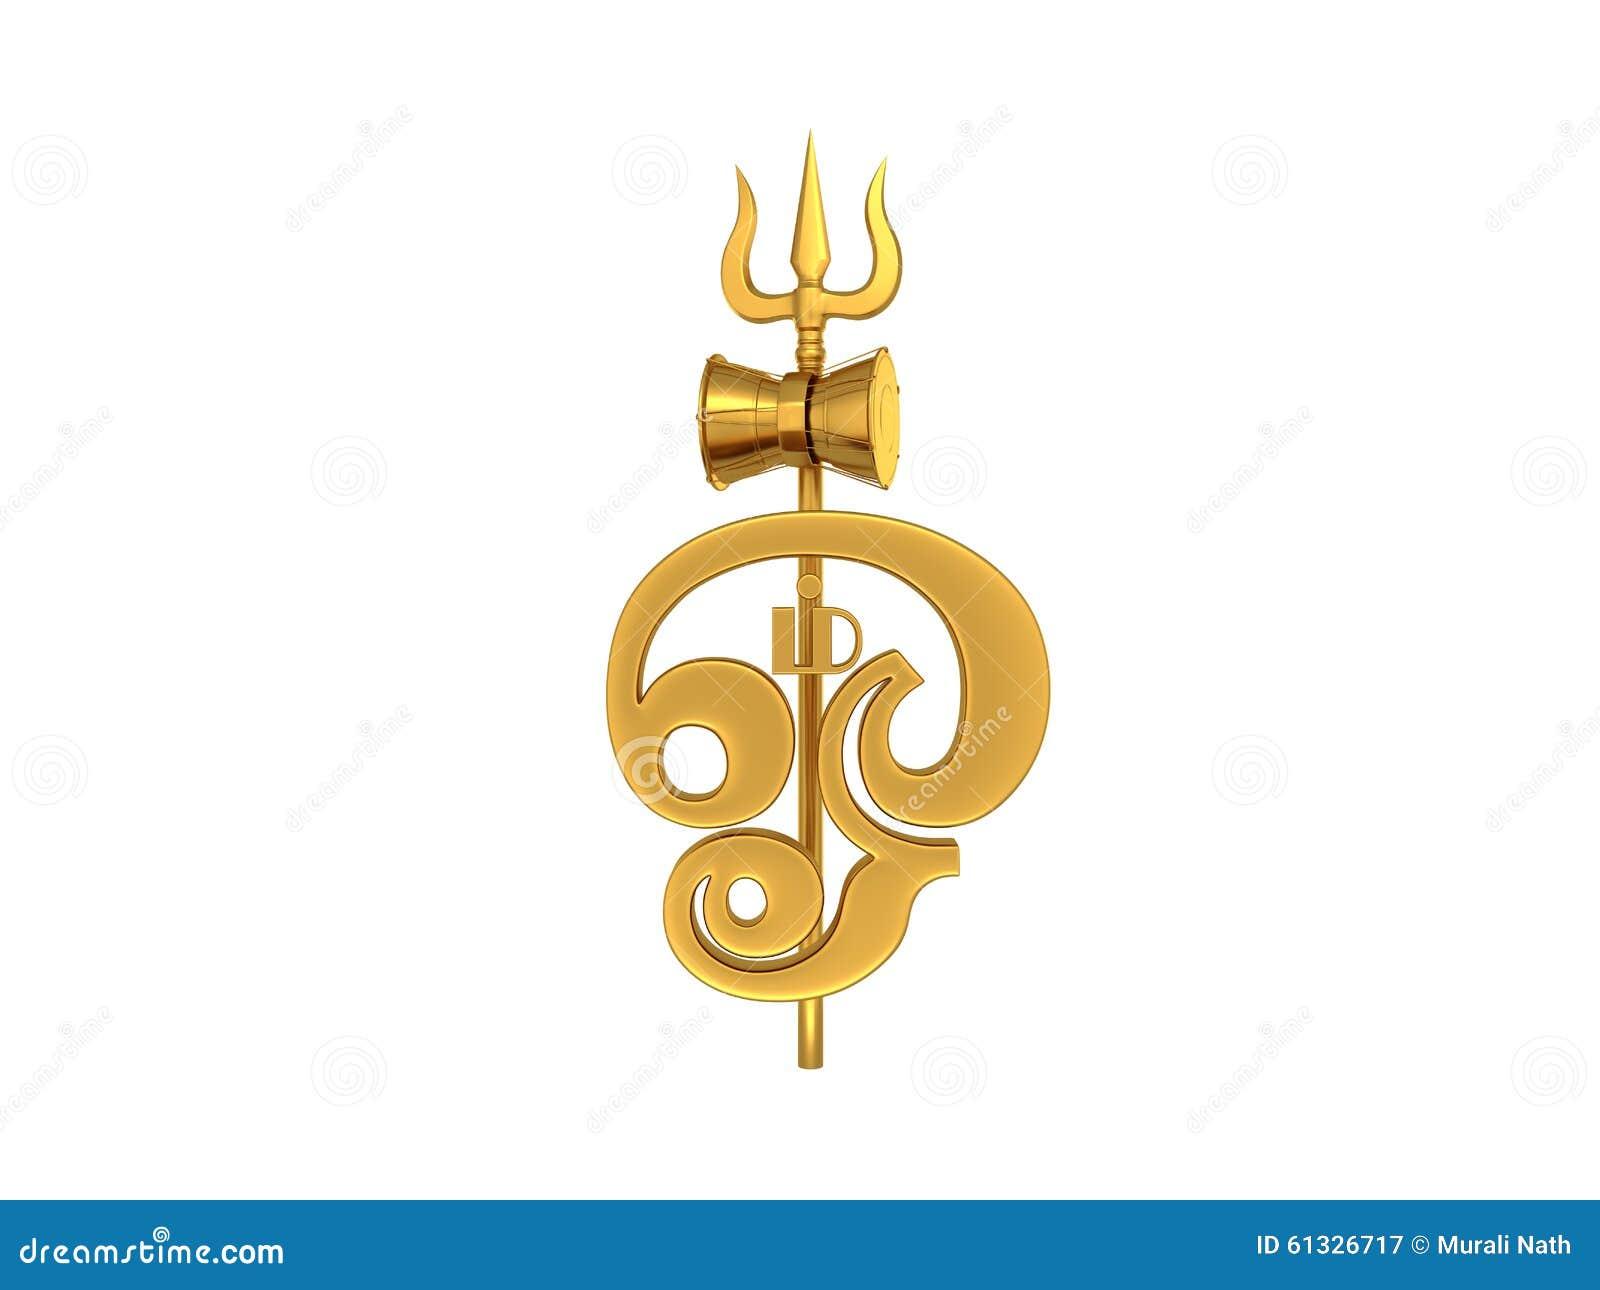 Tamil om symbol mit trident stock abbildung bild 61326717 Om picture download